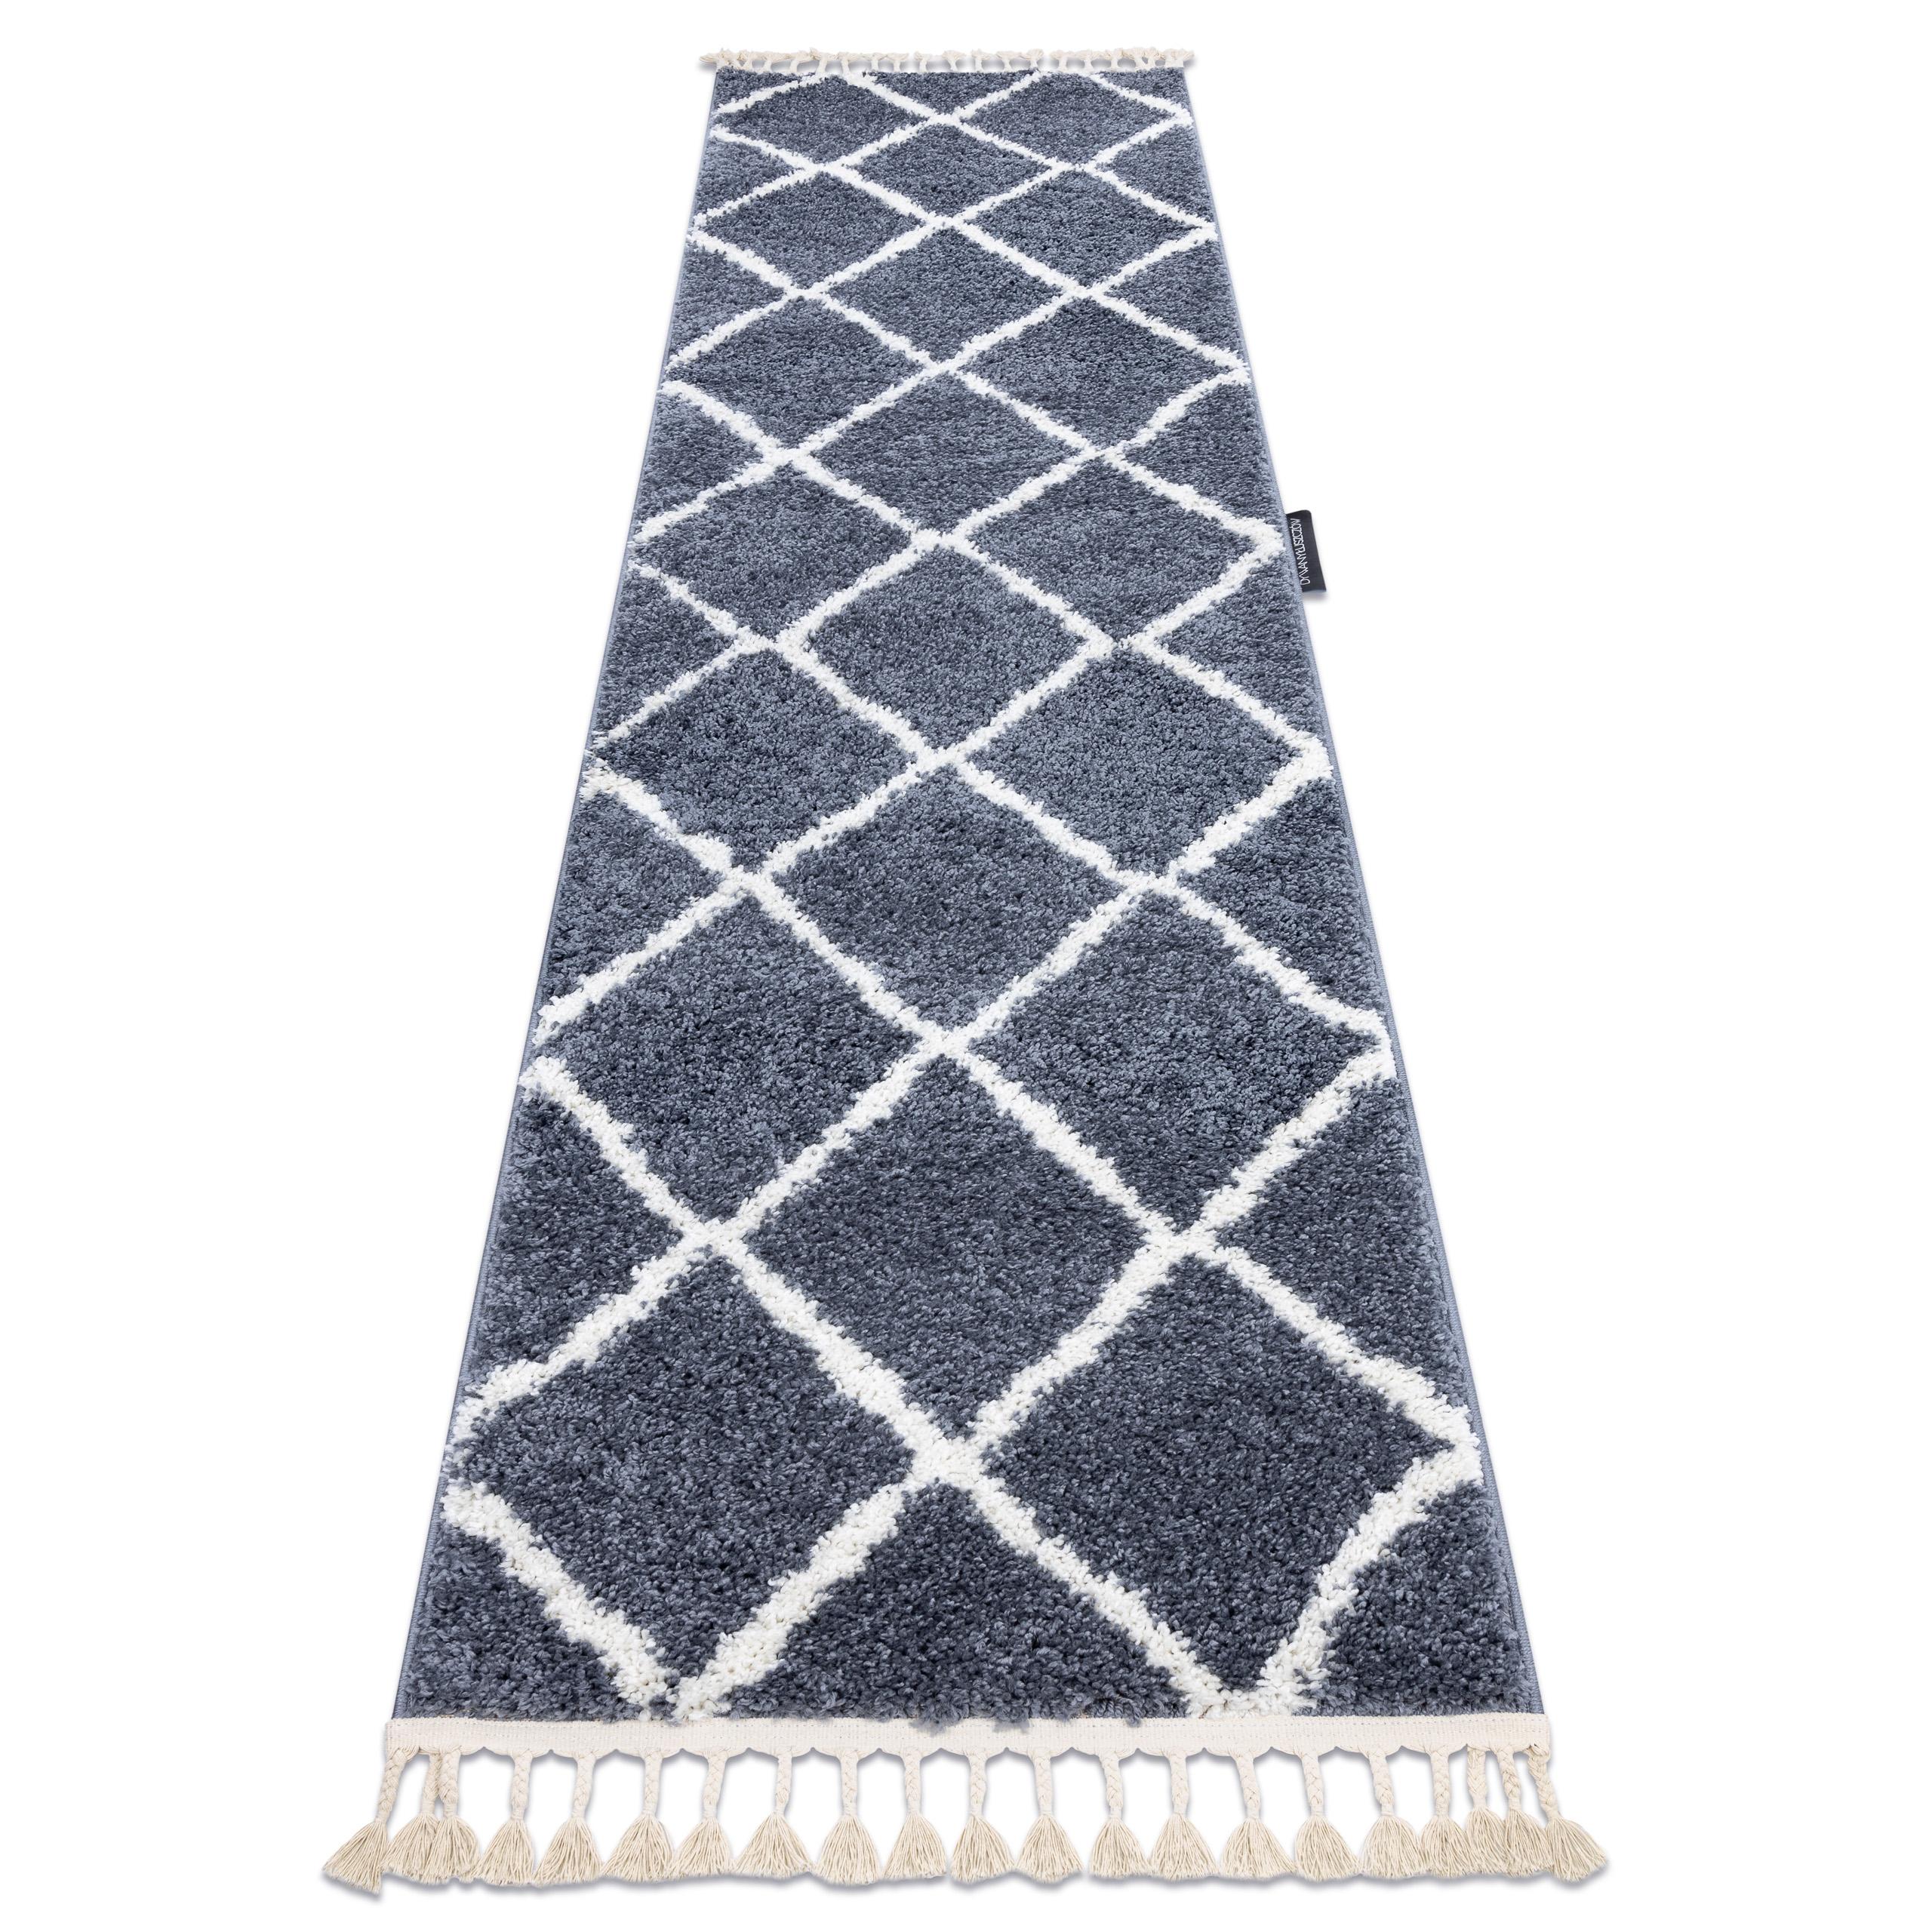 Carpet Runner Berber Cross Grey For The Kitchen Corridor Hallway Berber